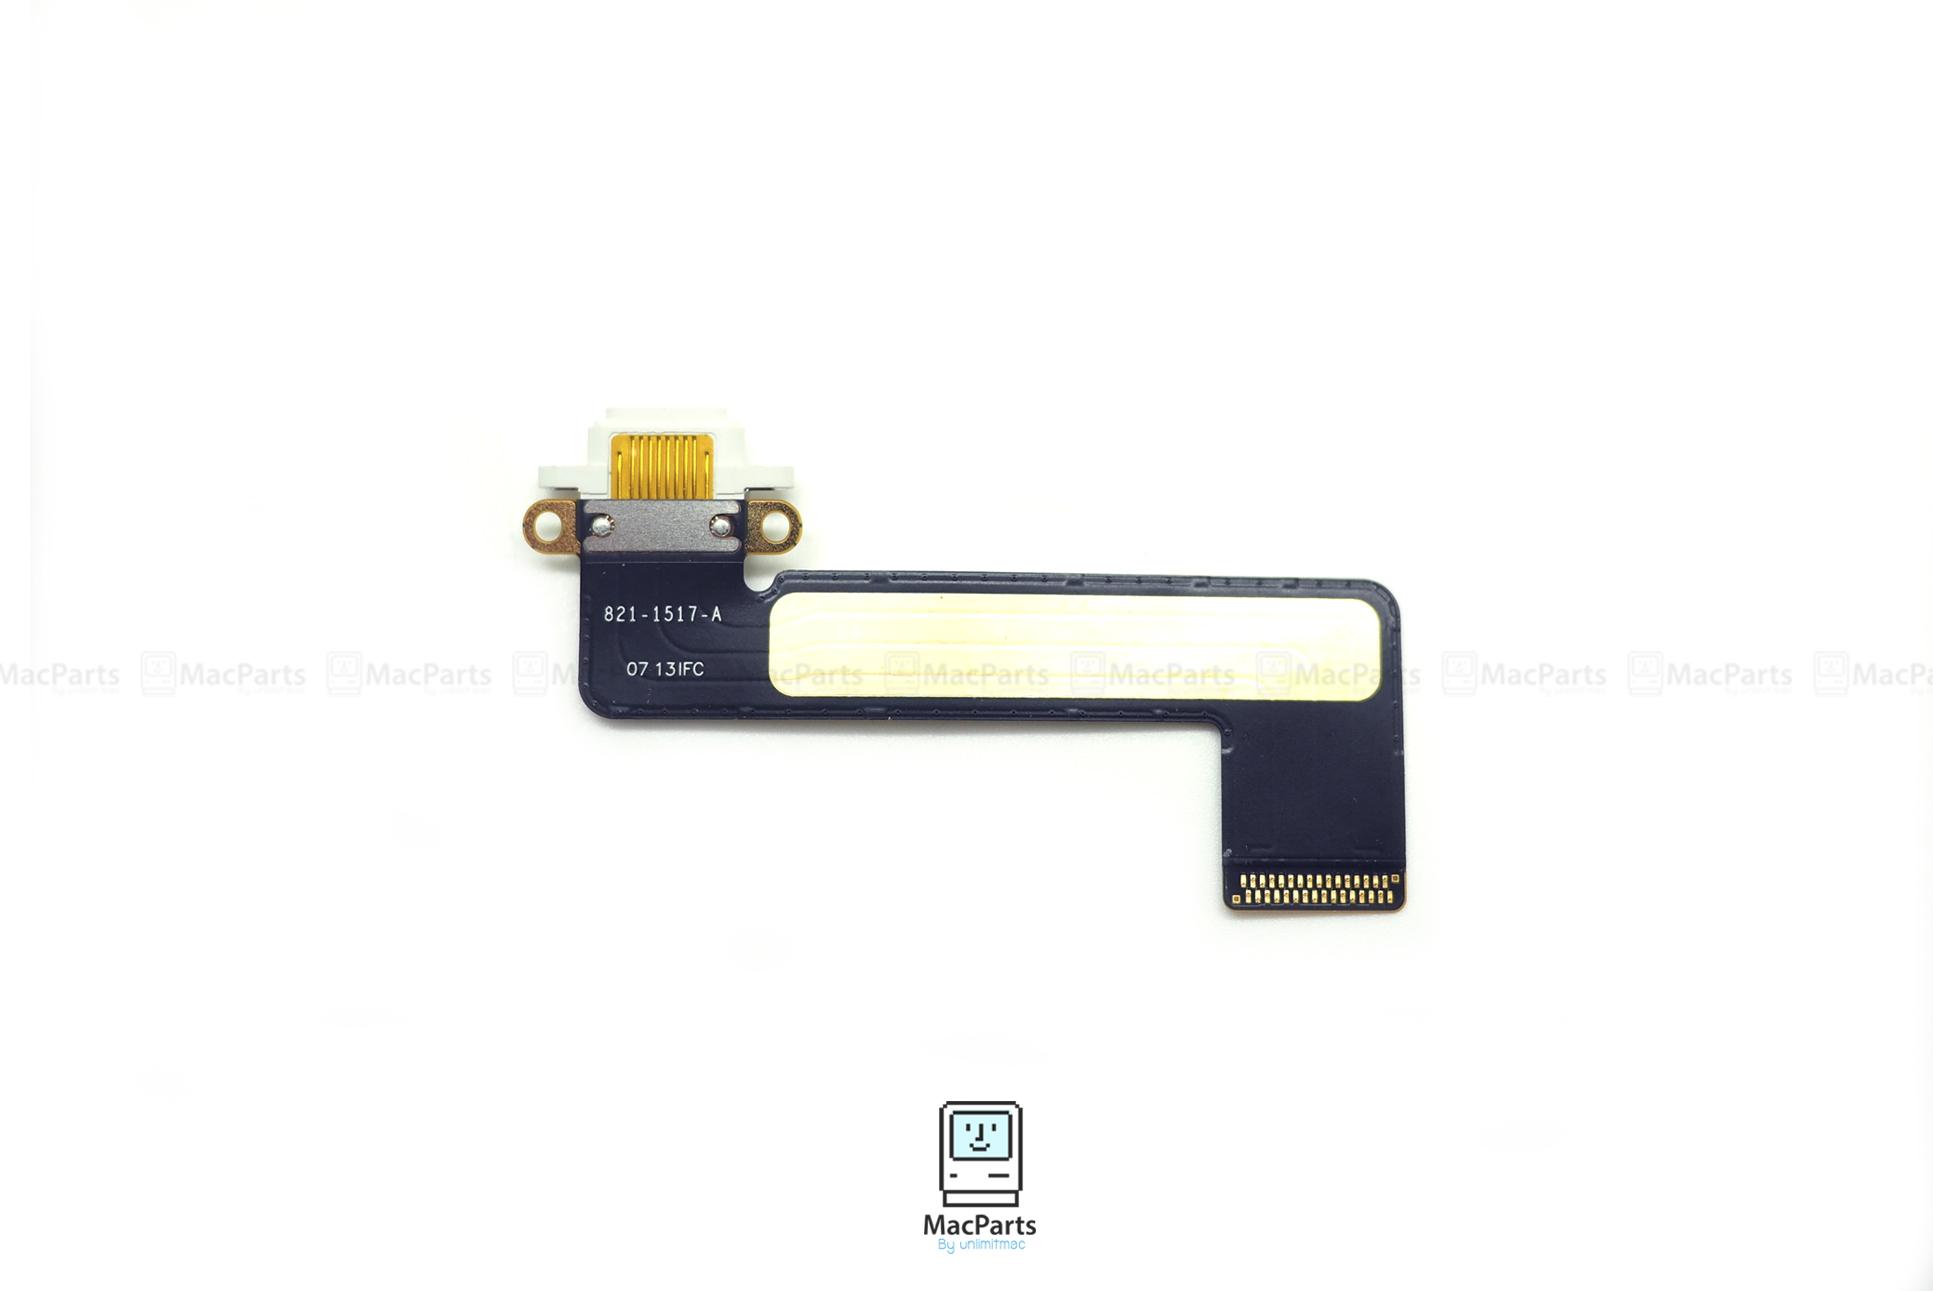 821-1517-A iPad mini Lightning Connector White